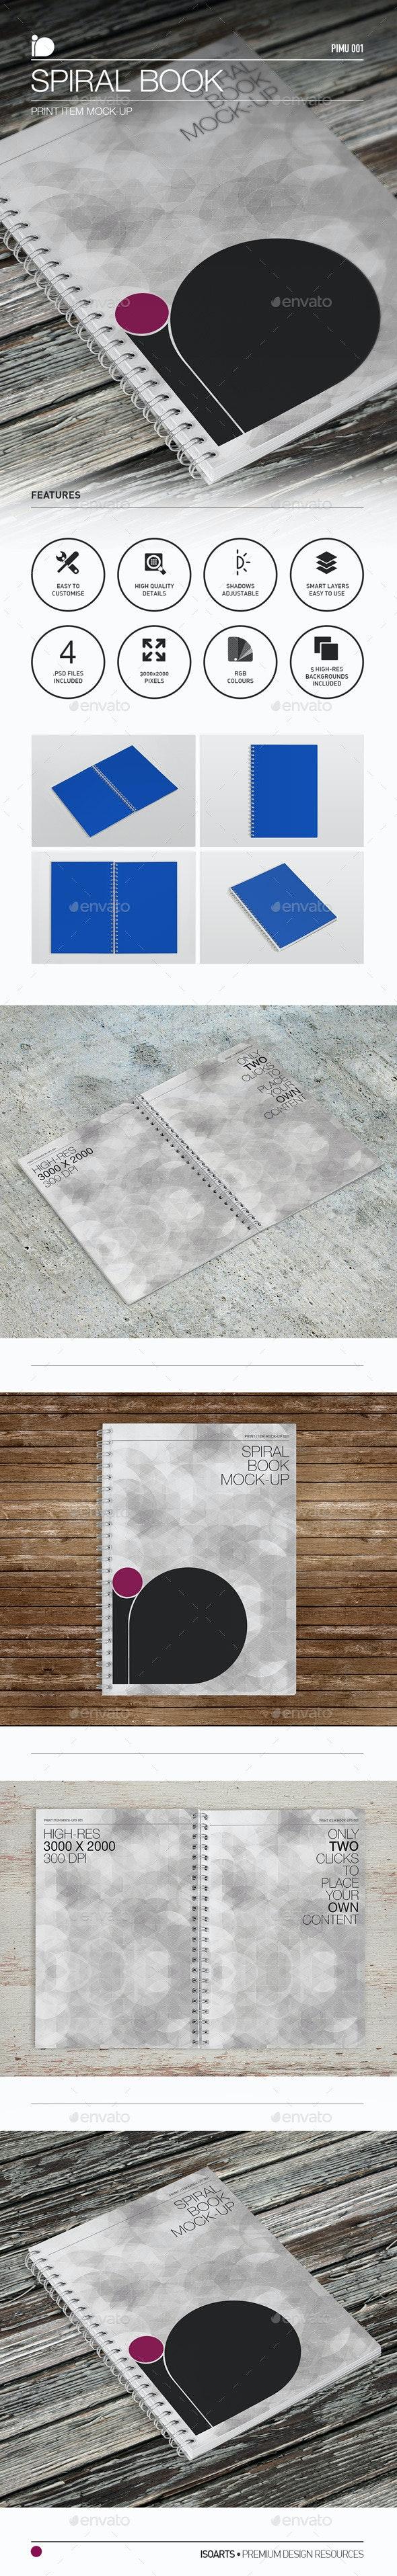 Mock-Up • Spiral Book - Print Product Mock-Ups